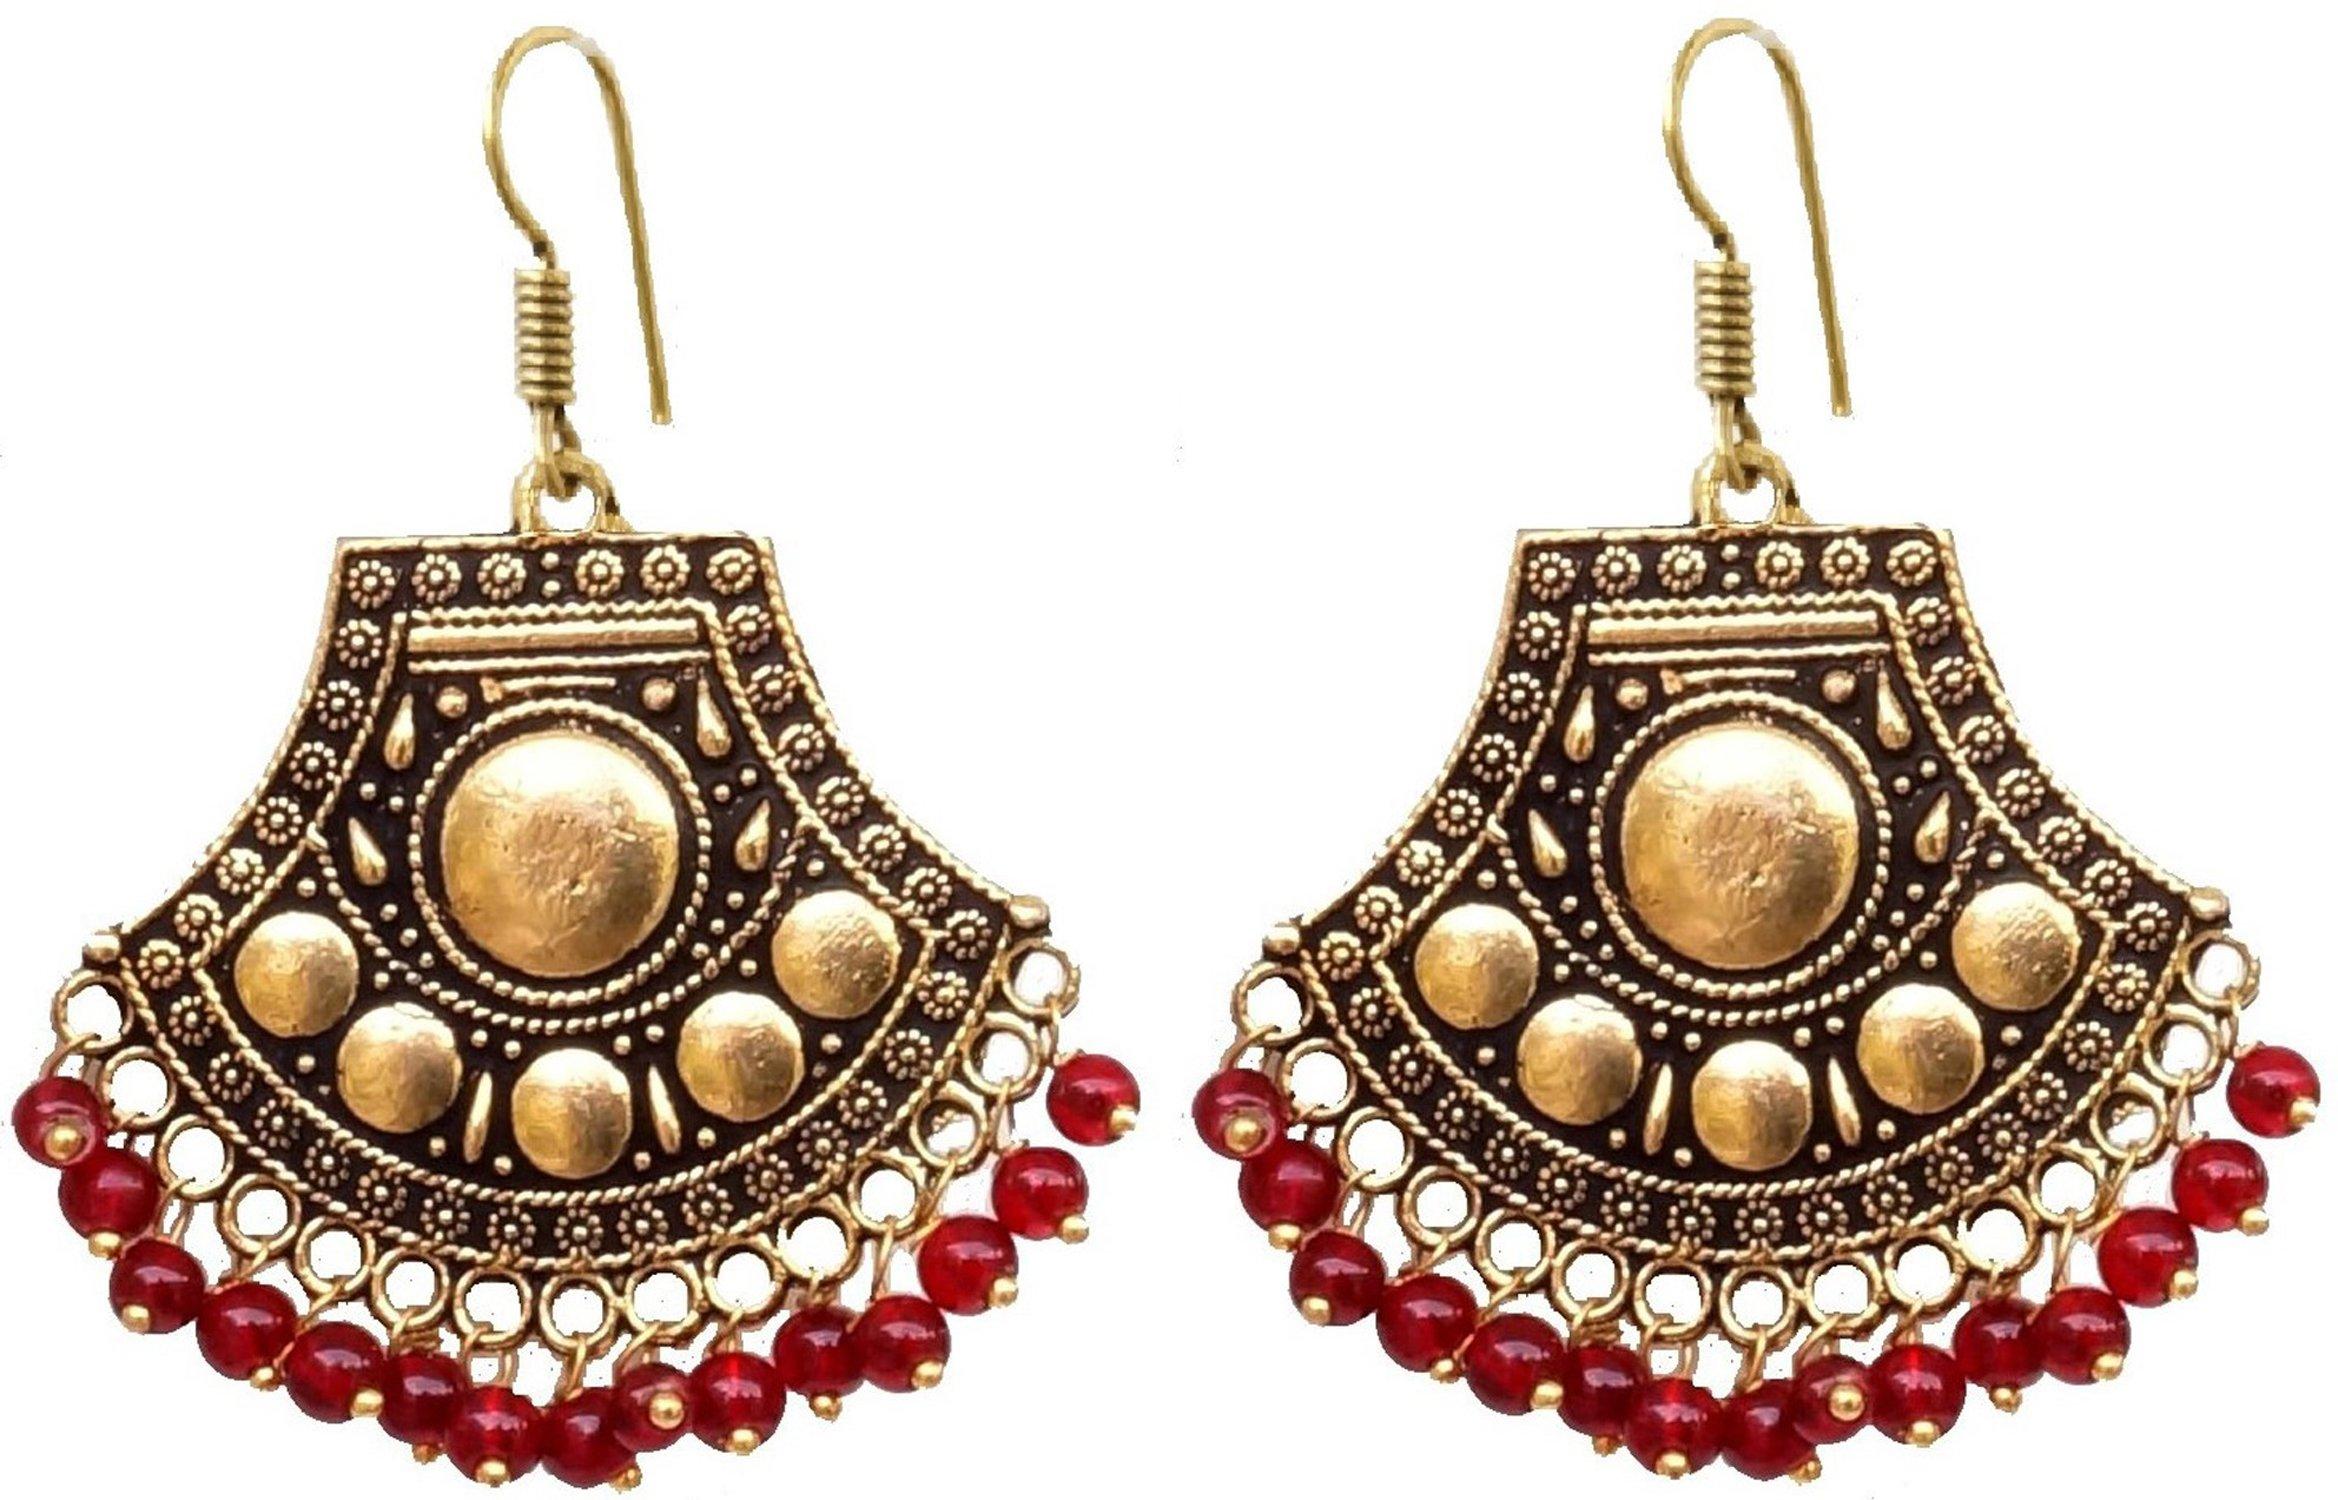 Sansar India Boho Oxidized Beaded Chandbali Indian Earrings Jewelry for Girls and Women